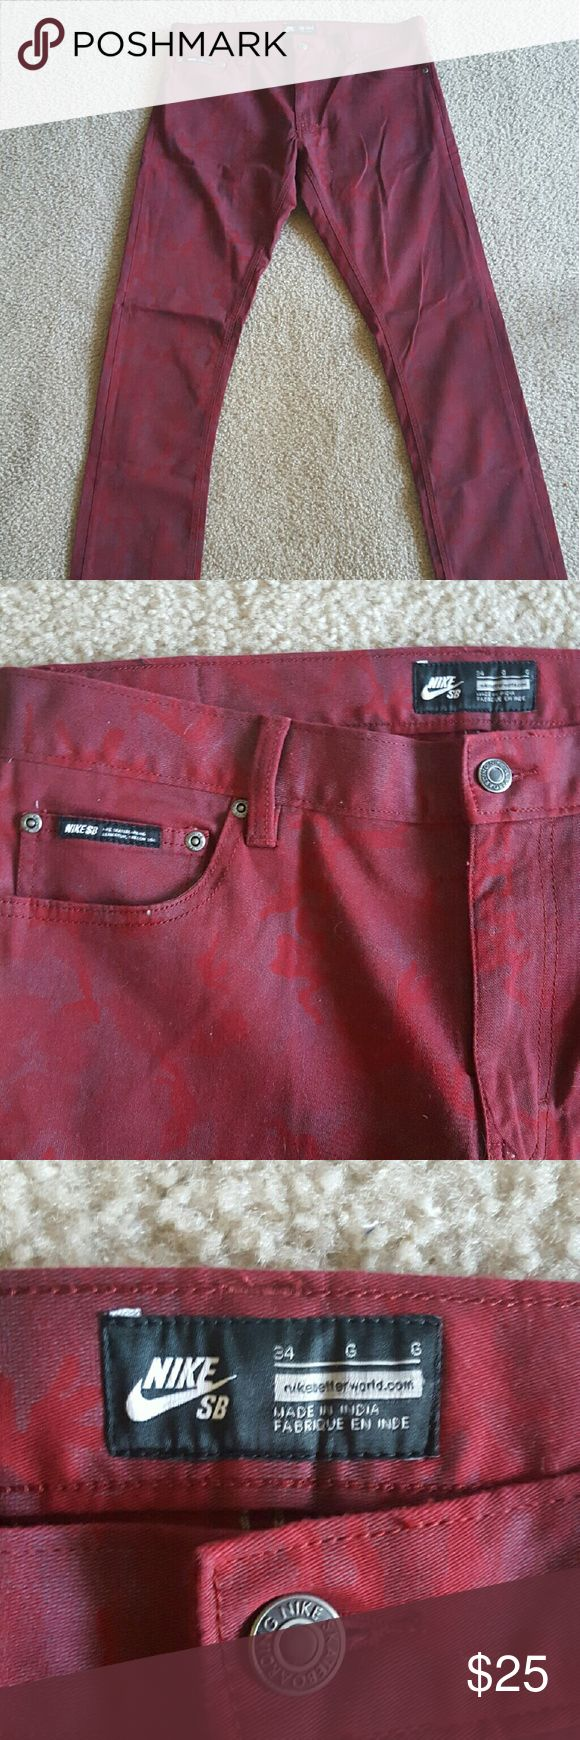 Nike SB Mens Pants - Size W34 New, never worn men's Nike SB (Skateboard) Pants. Dark red, camo print, slim fit. Size W34.  Make me an offer! Nike Jeans Slim